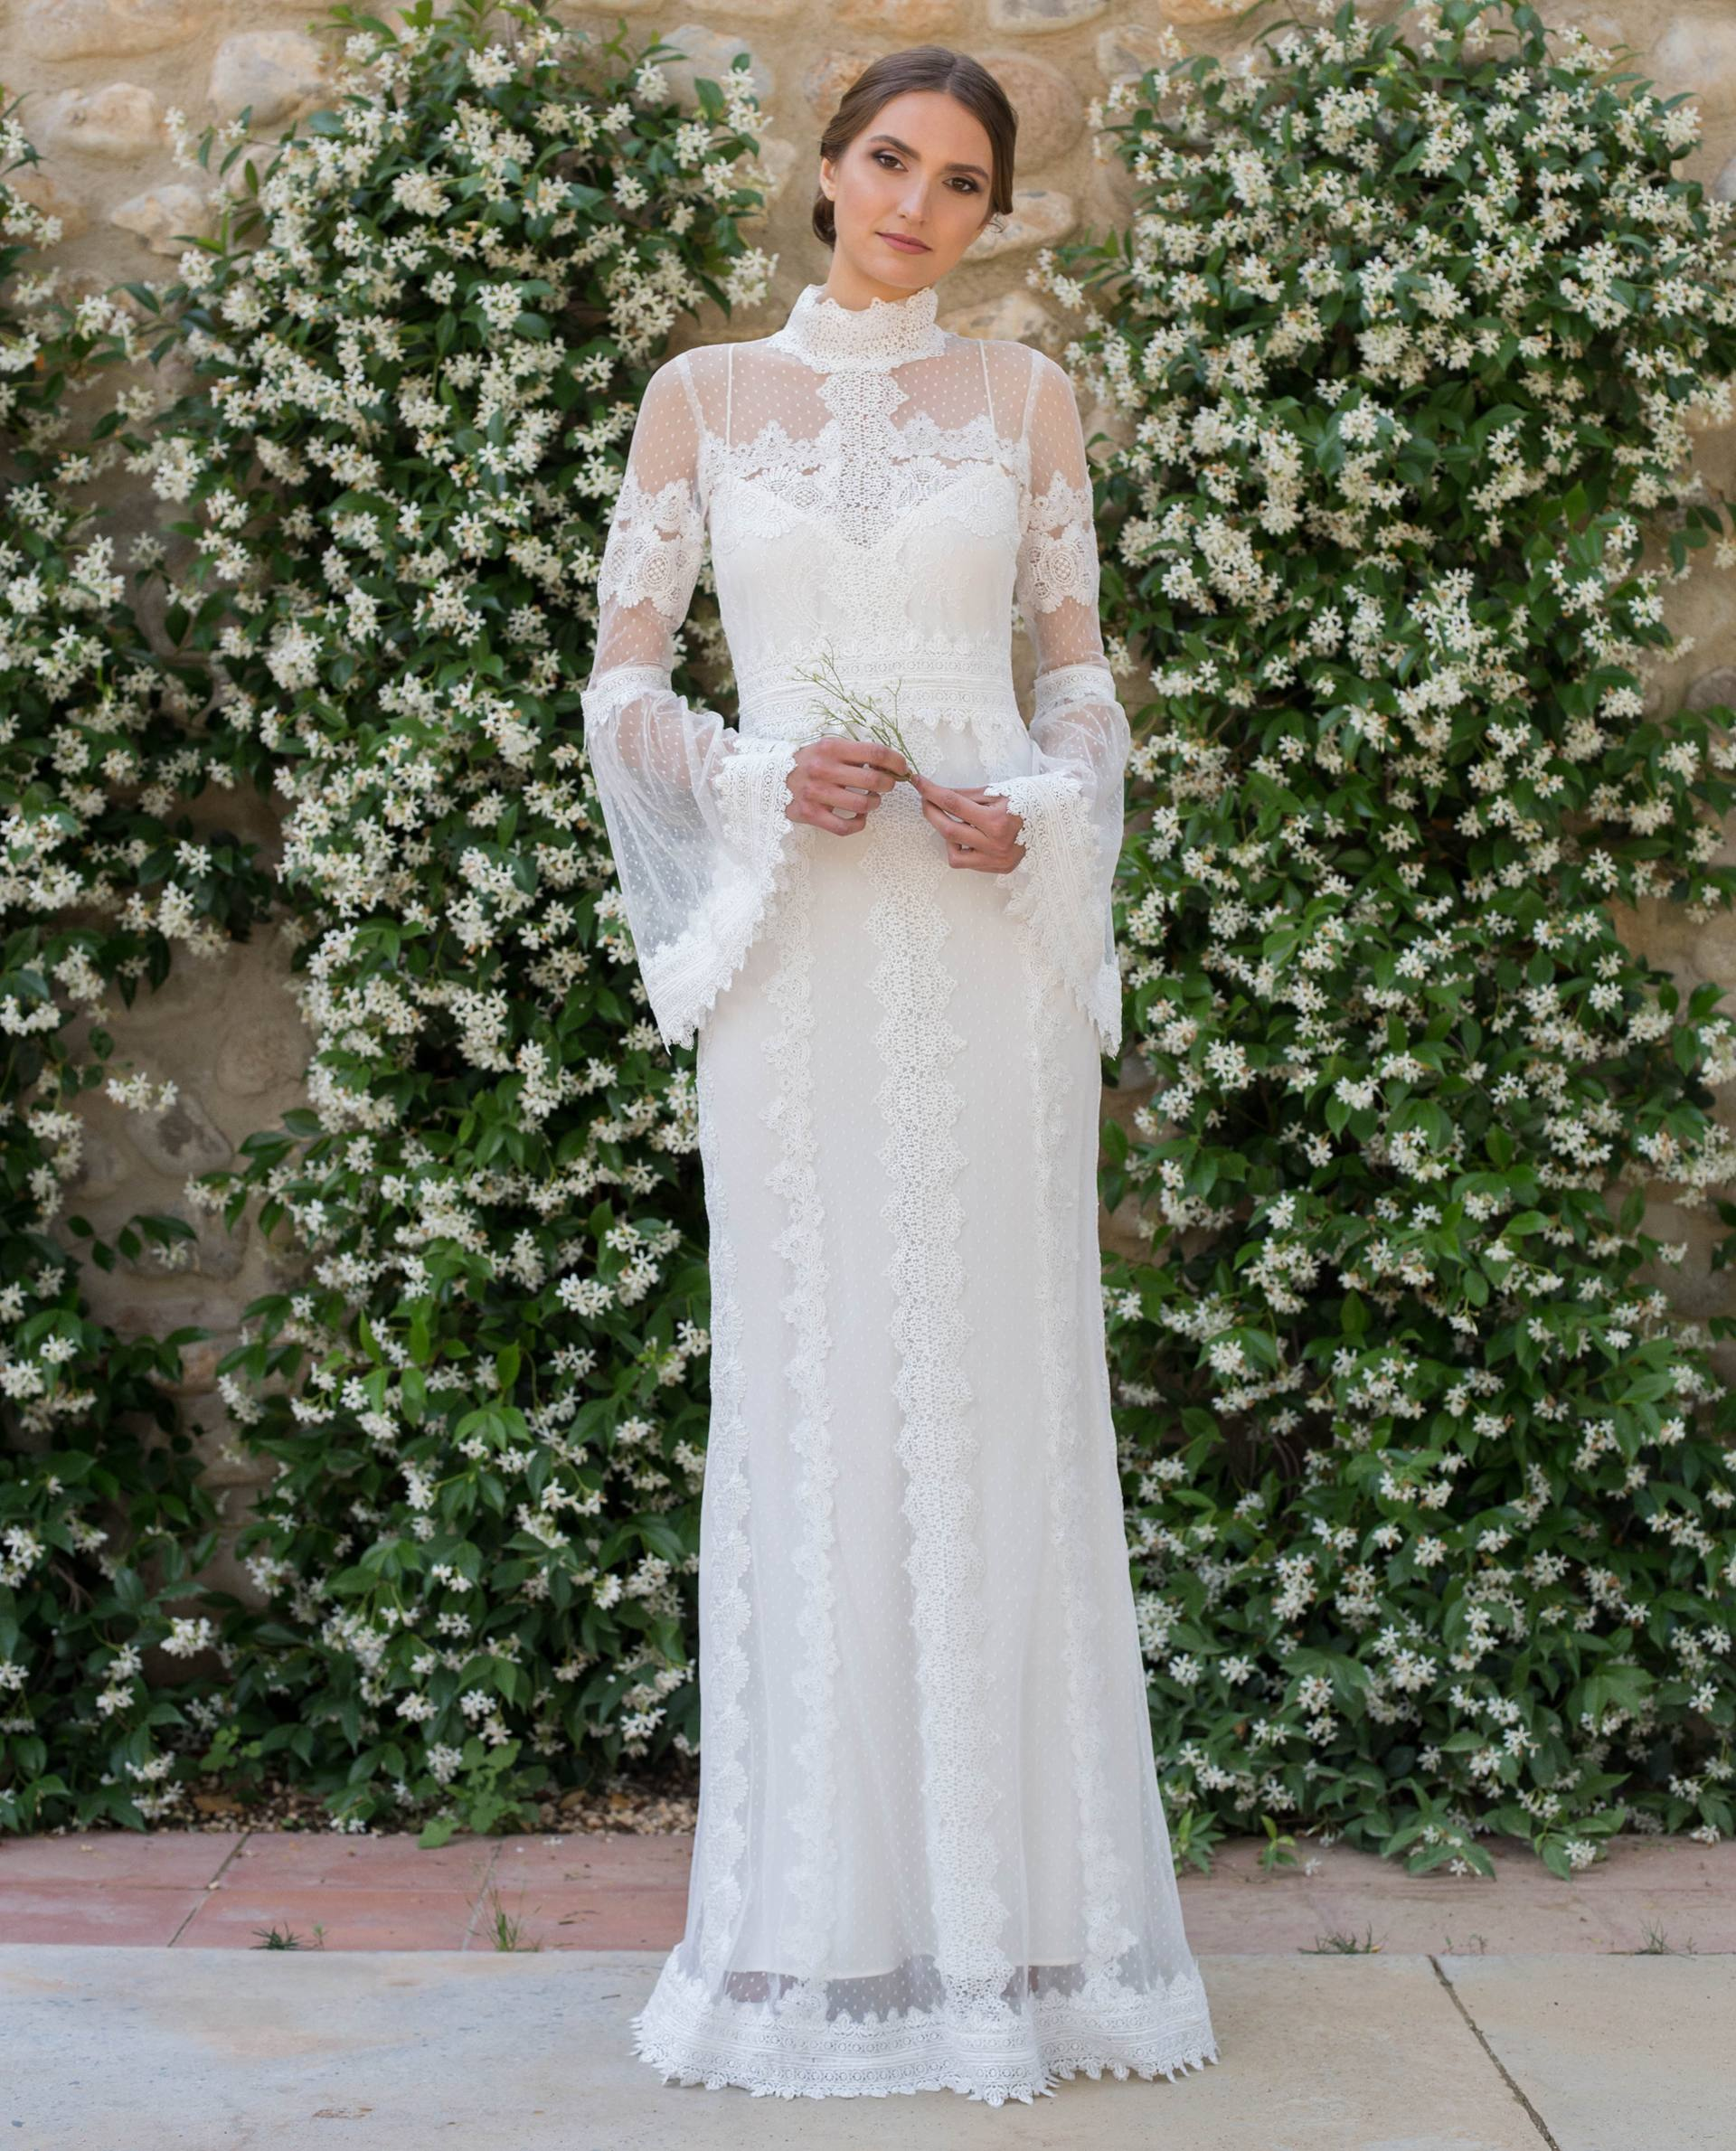 BRIDAL-NATURE 2017/18 - VESTIDOS - vestido novia Julia